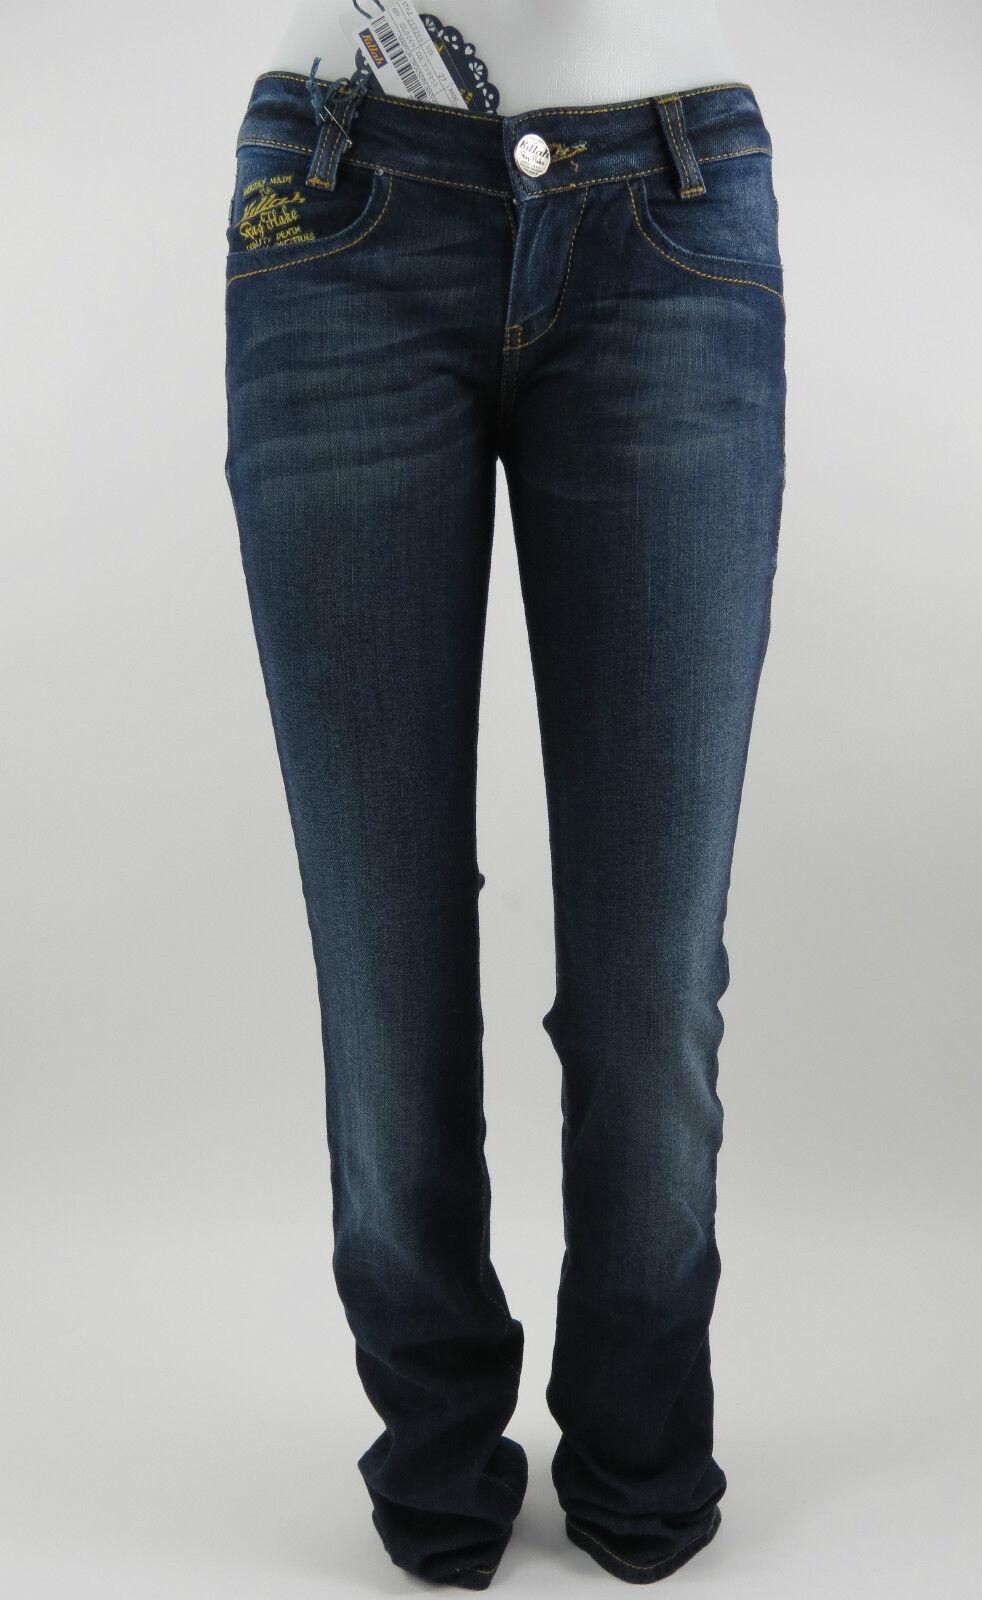 Killah Jeans MARYLIN TROUSERS (BASI-K) DL0069 JI0200 L01179 +NEU+